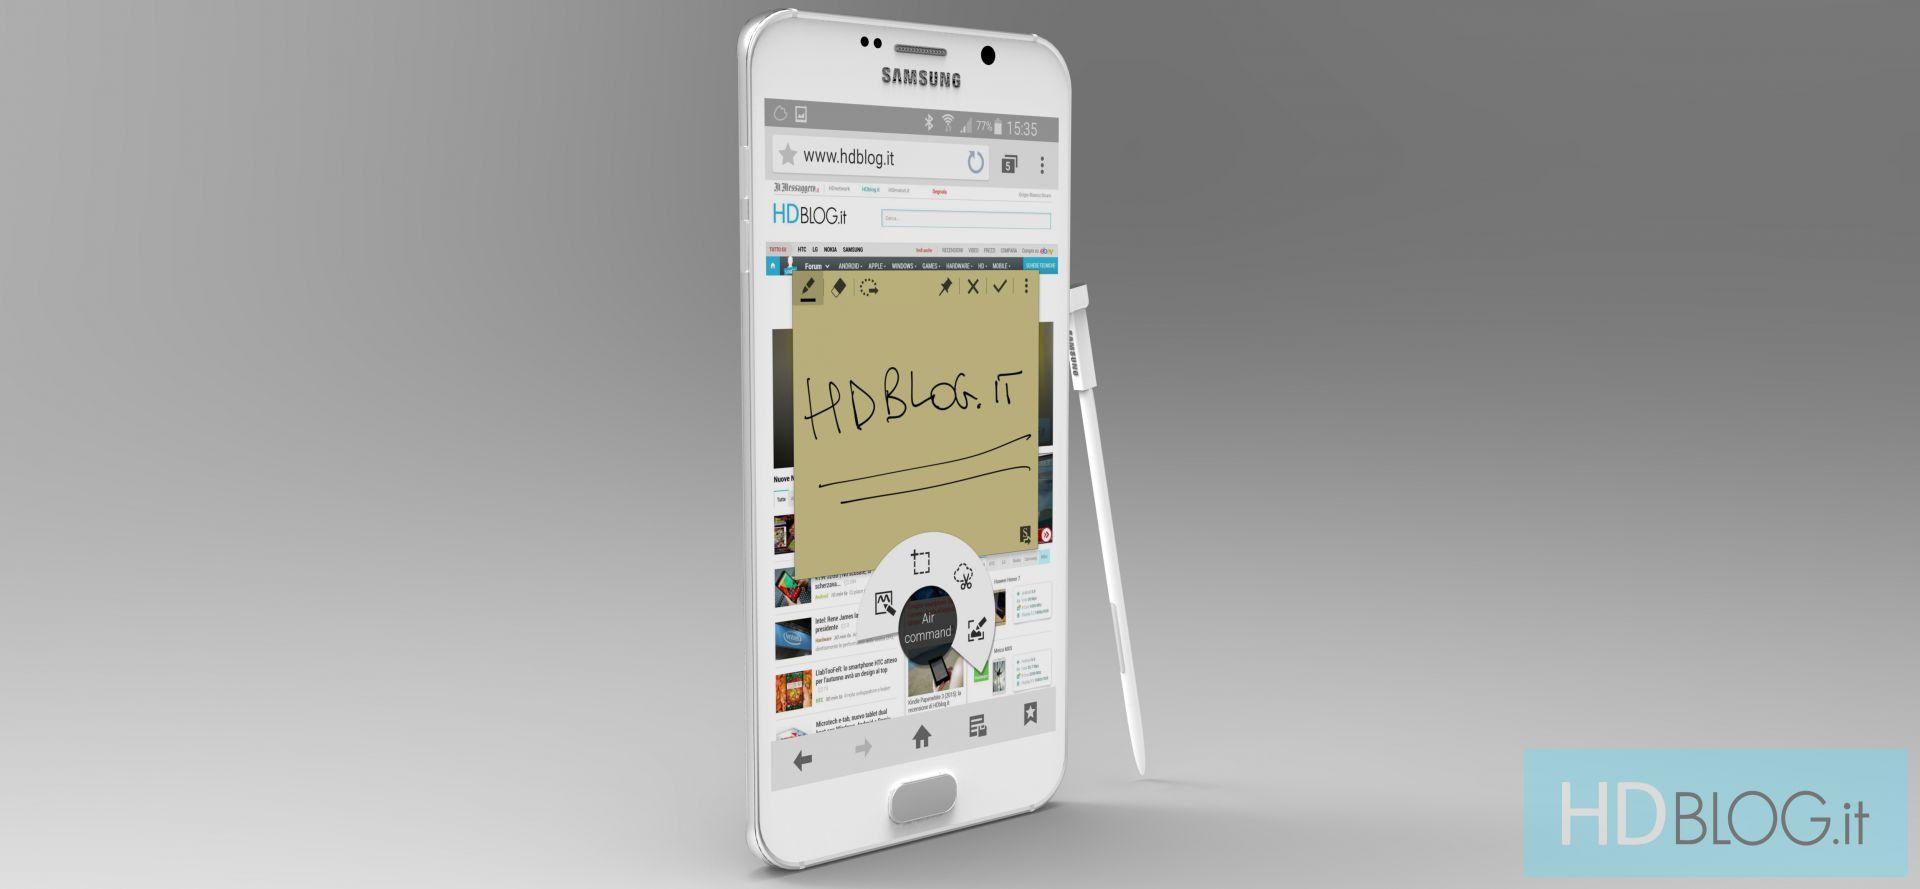 Galaxy-Note-5-schematics-and-concept-renders-11.jpg